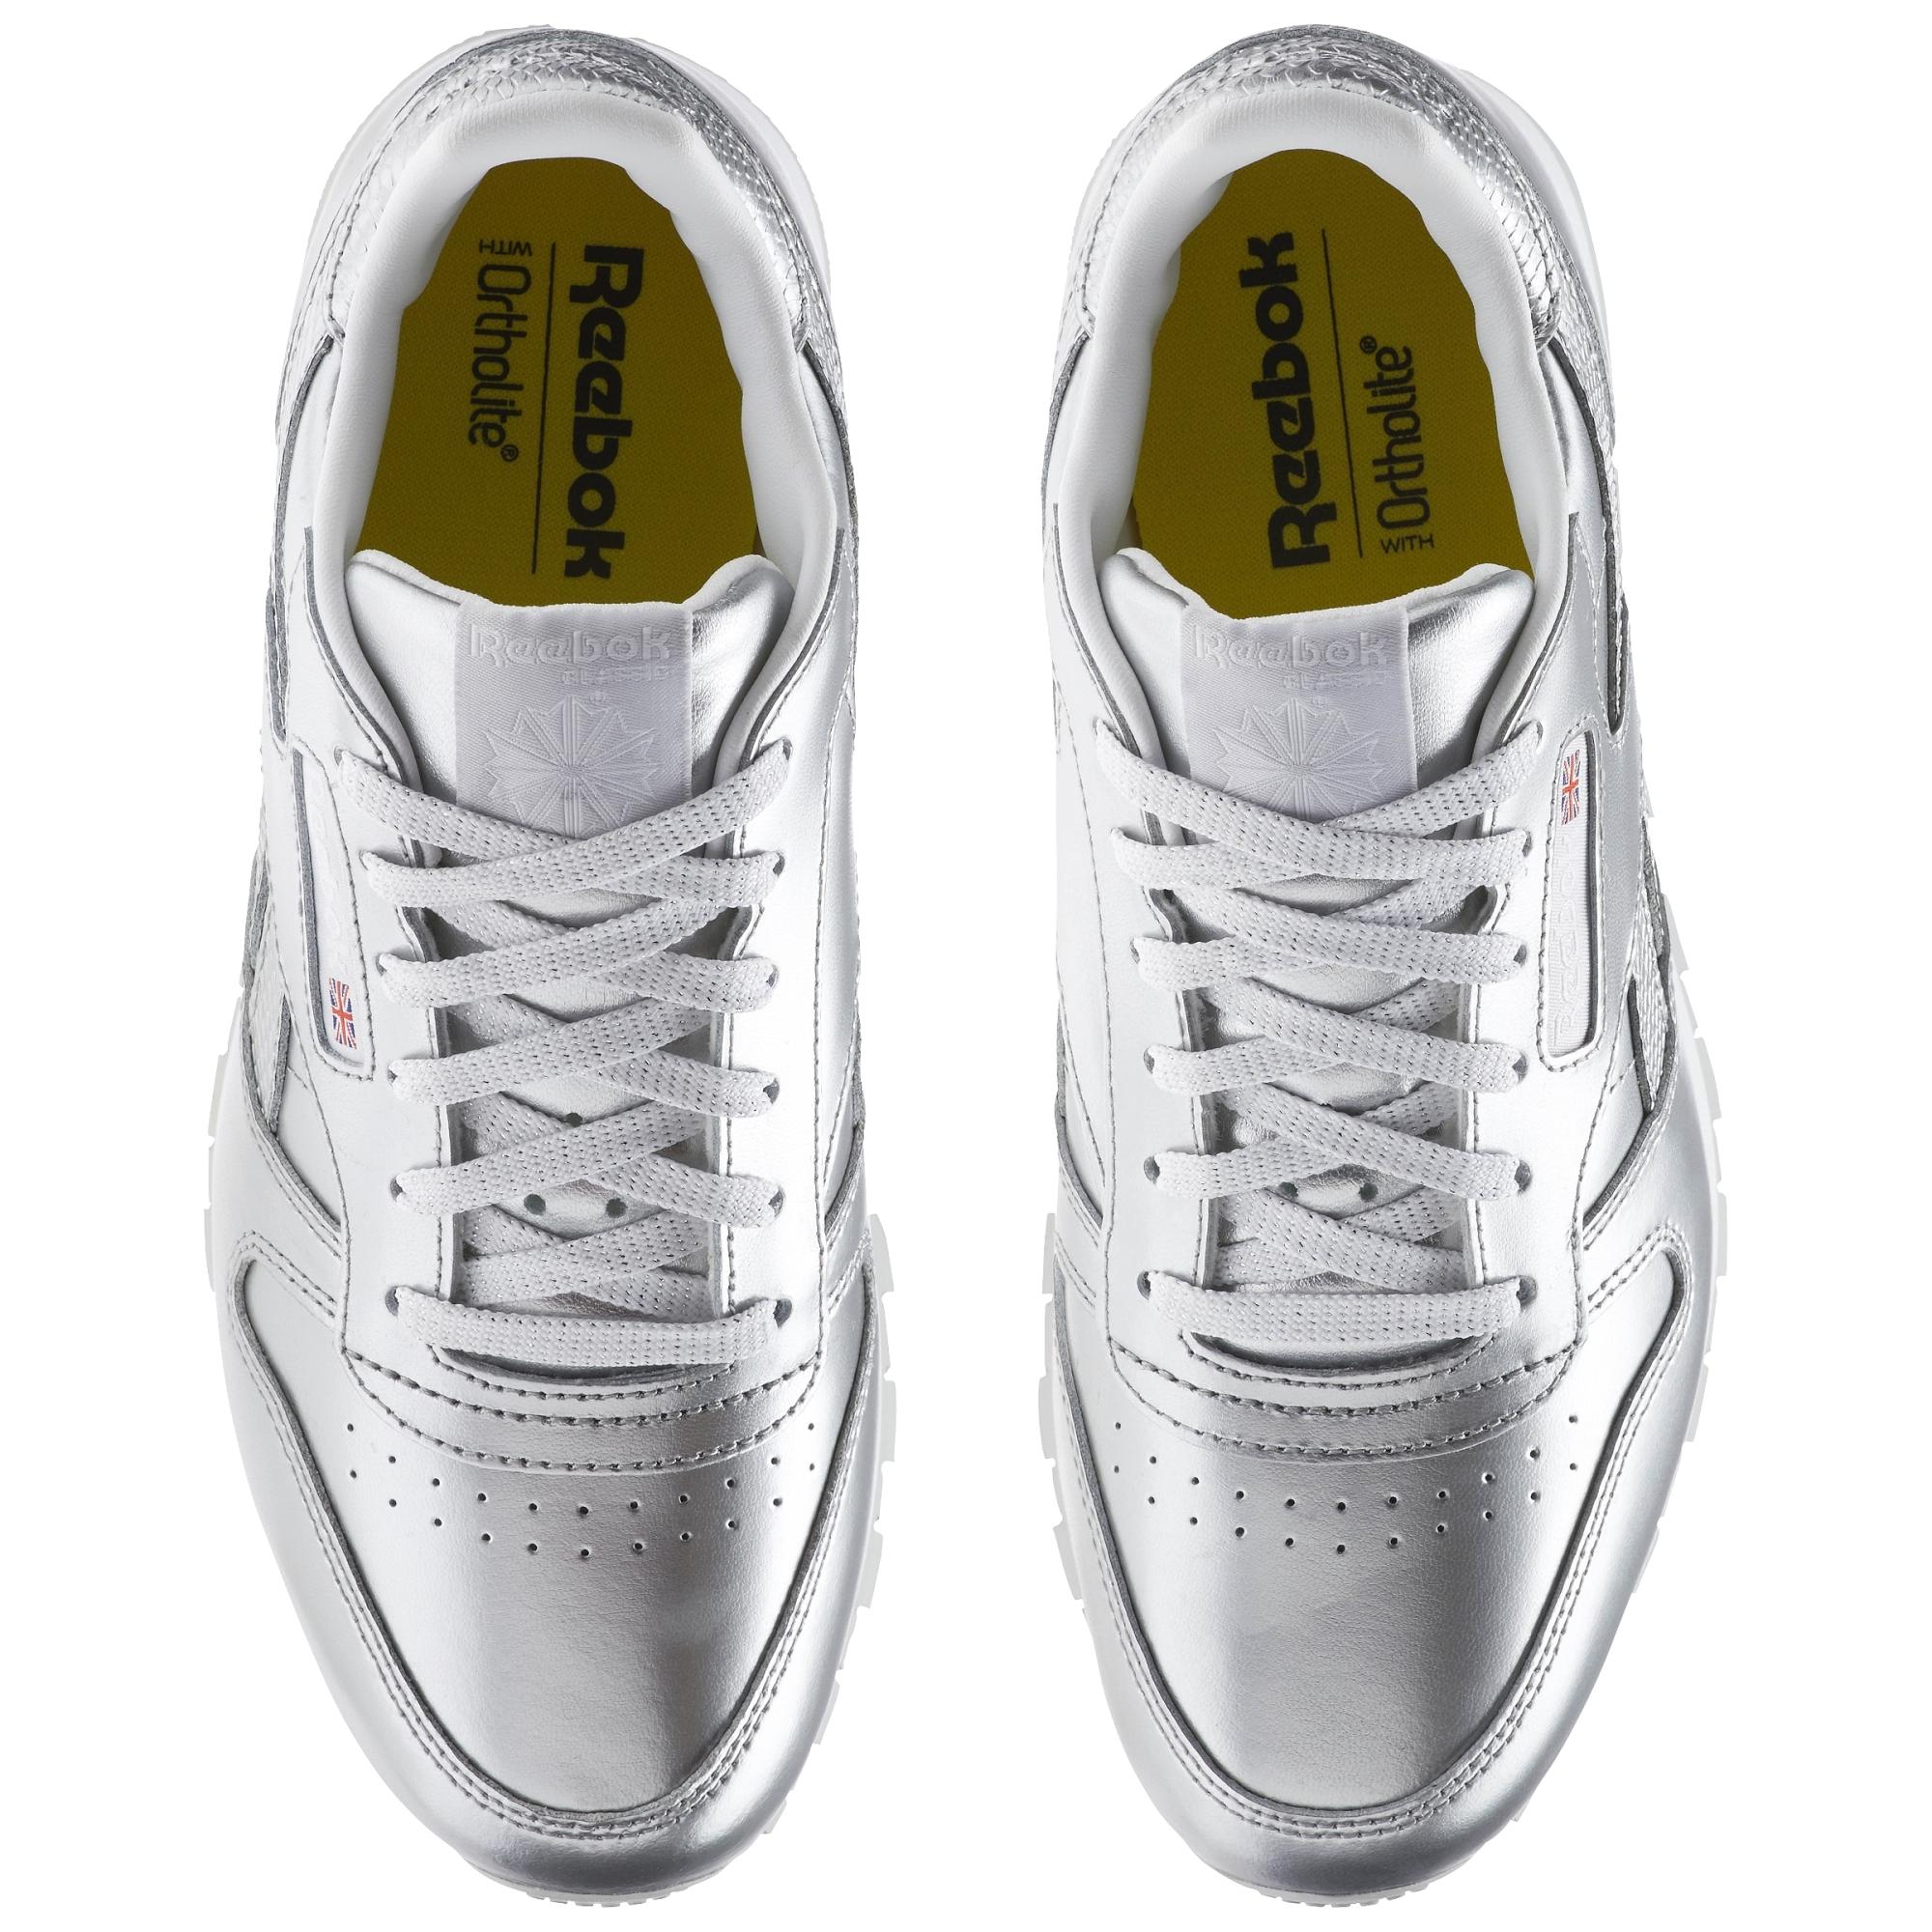 Reebok Classic Buty Reebook Classic Buty sportowe damskie srebrne w